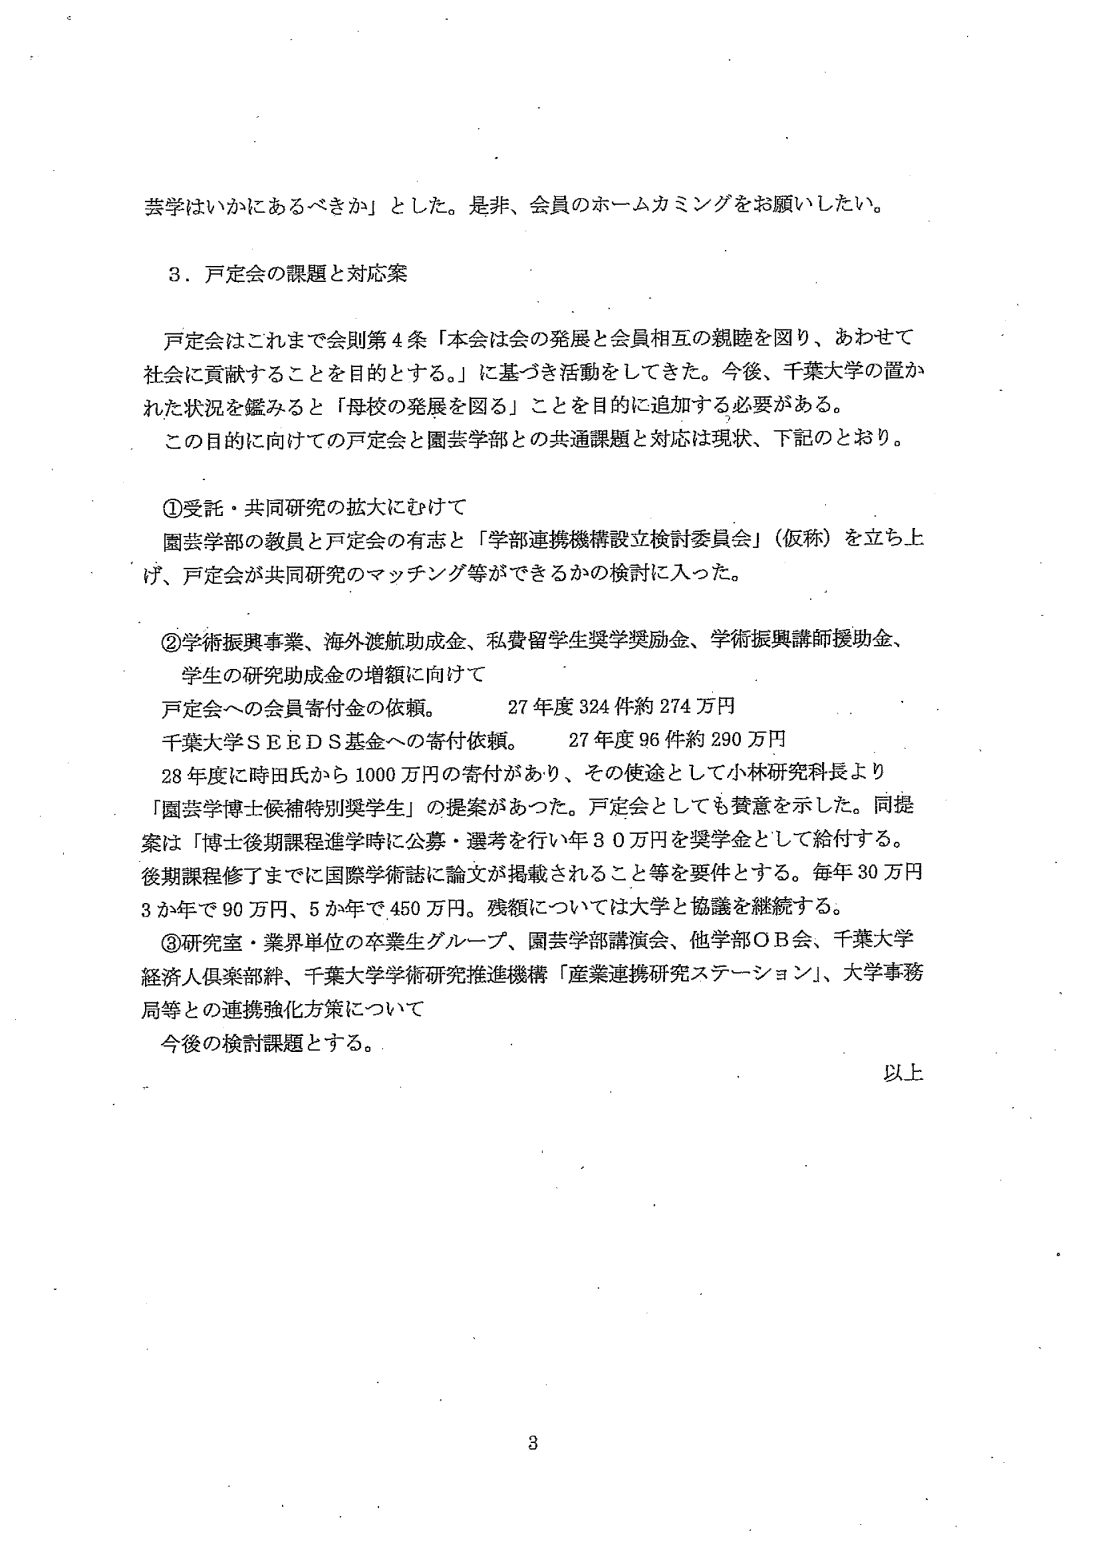 28長野支部総会資料_ページ_4.png